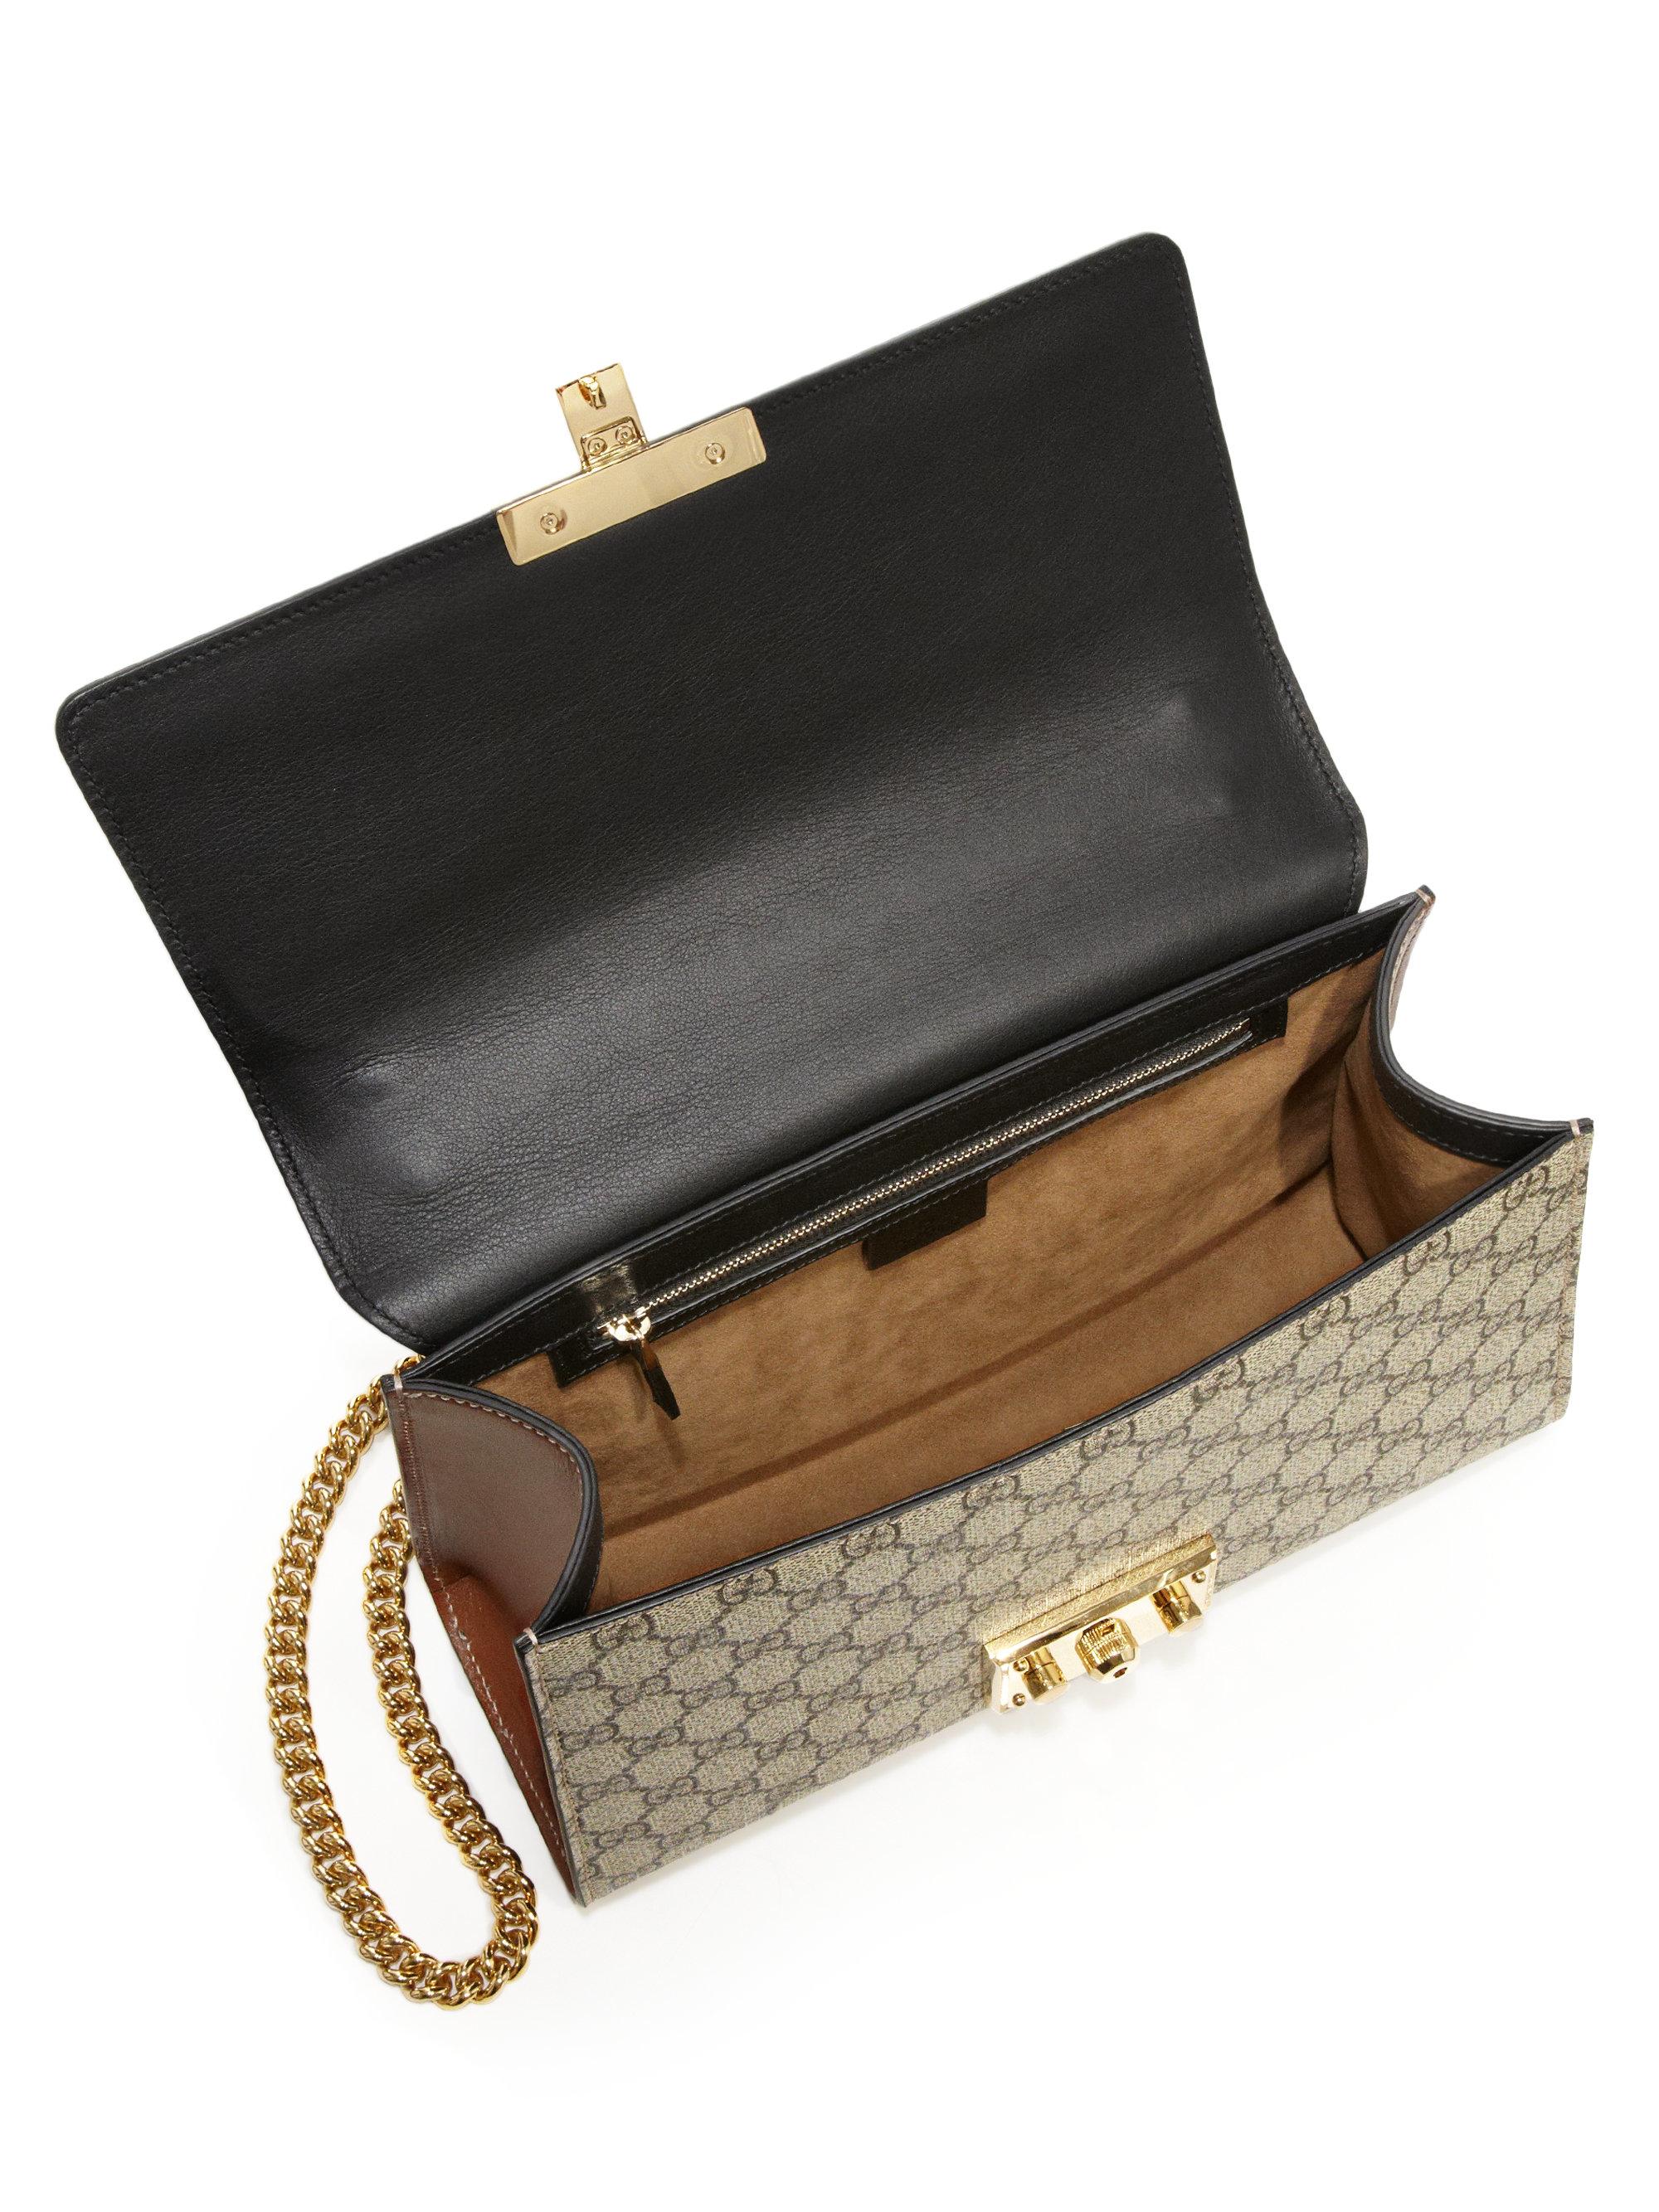 9d6118d07e8 Lyst - Gucci Padlock Gg Supreme Medium Shoulder Bag in Black